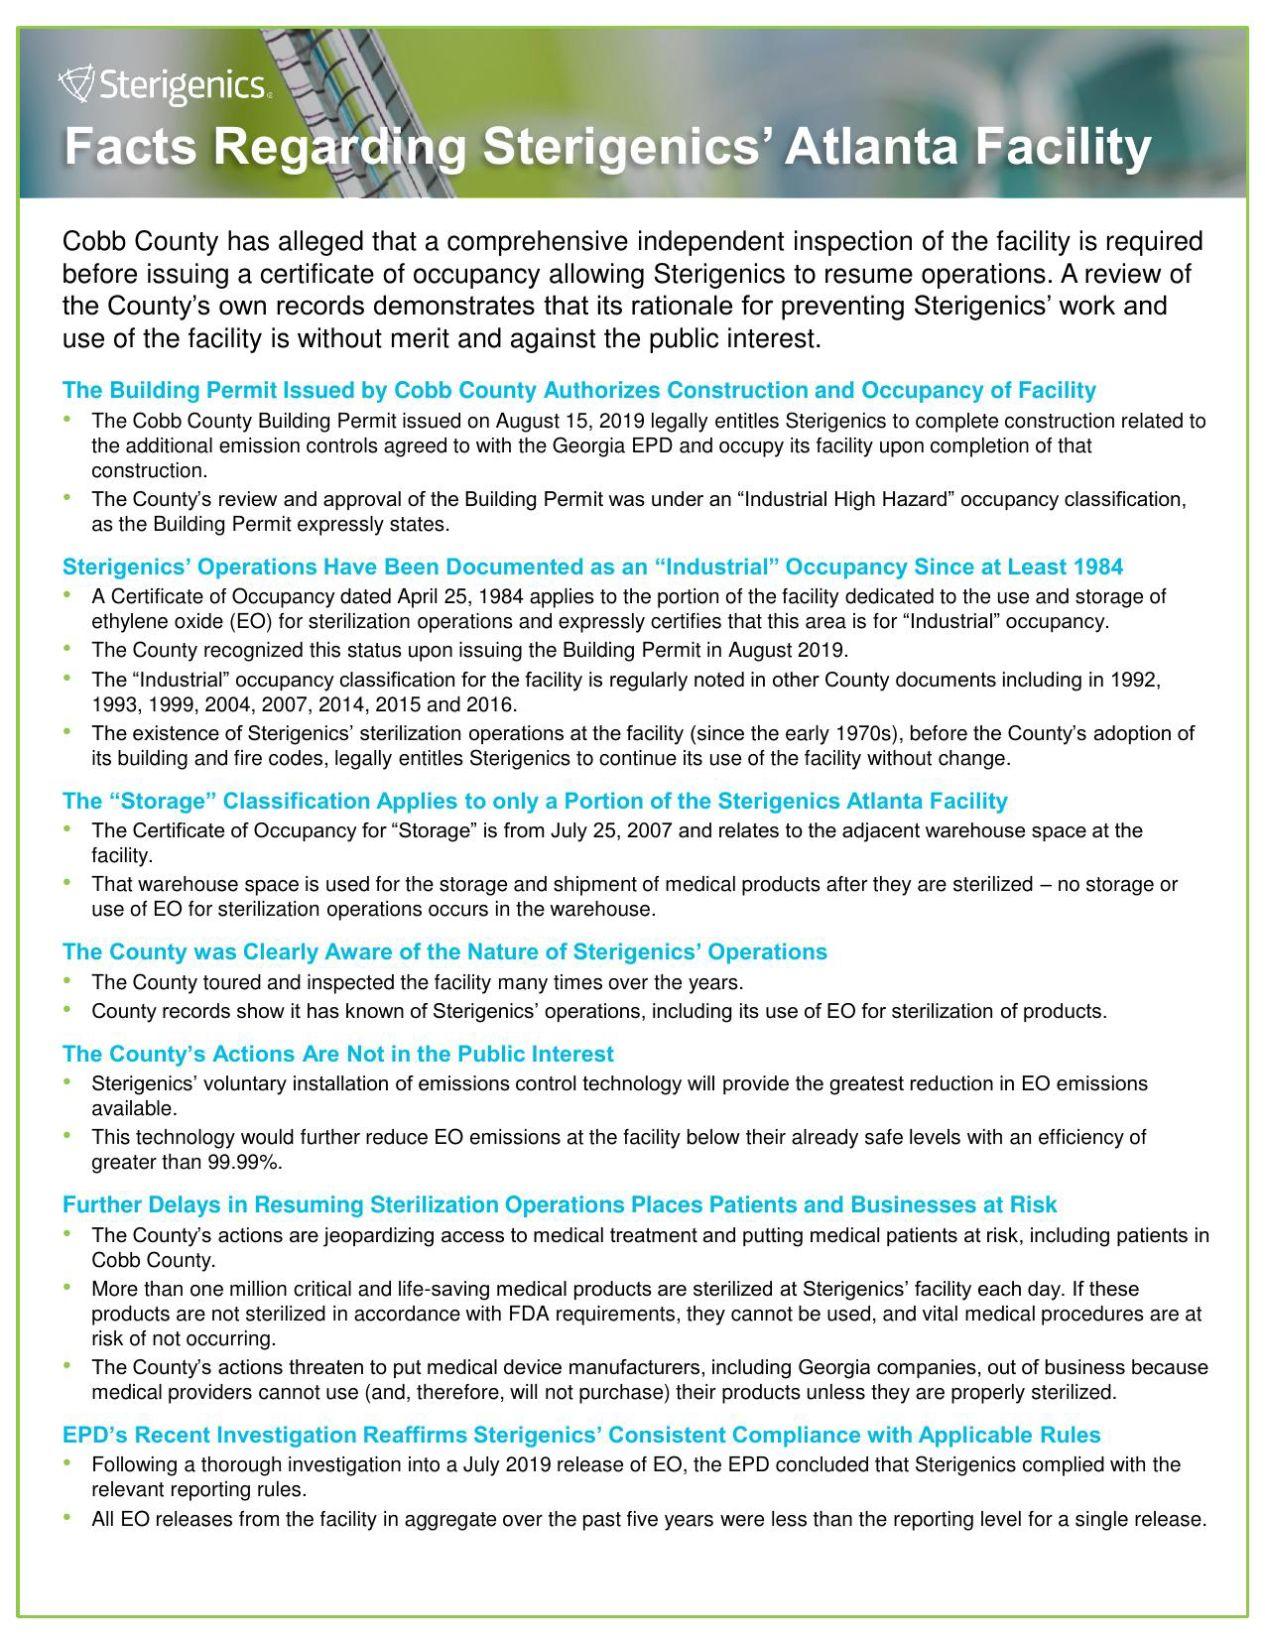 Sterigenics Cobb Fact Sheet